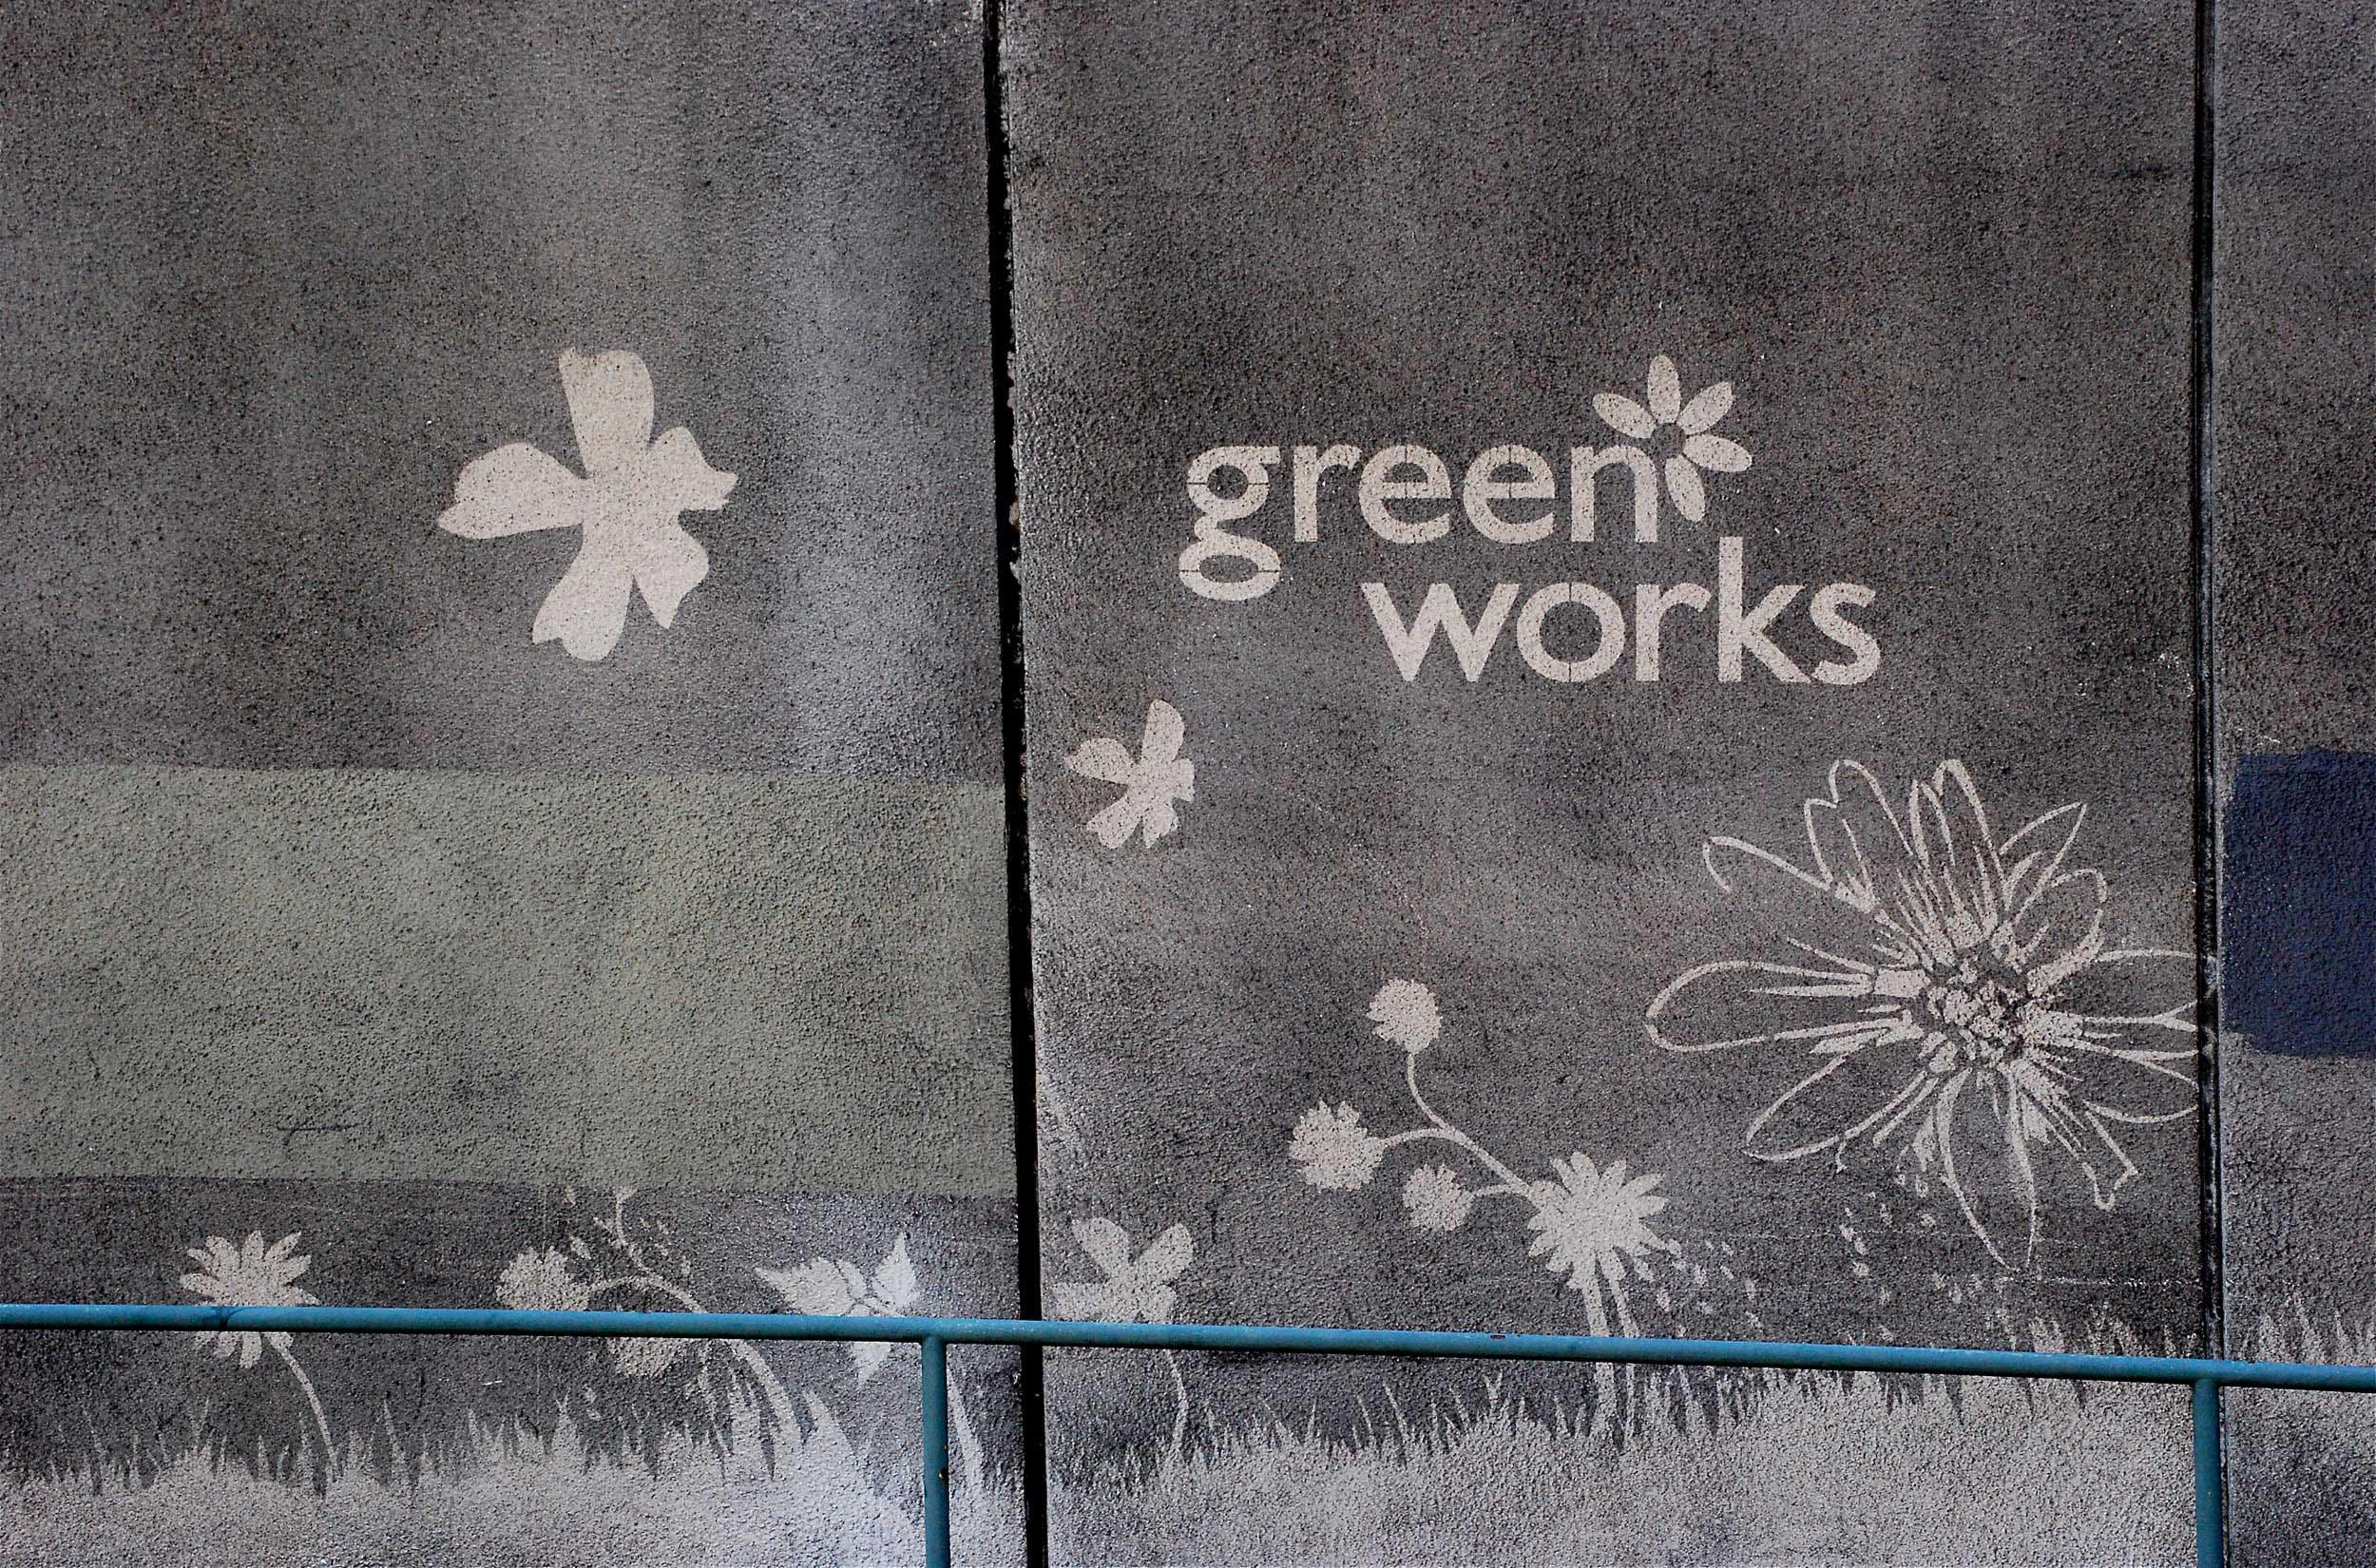 Paul_Curtis_Reversegraffitiproject_BC_01.jpg